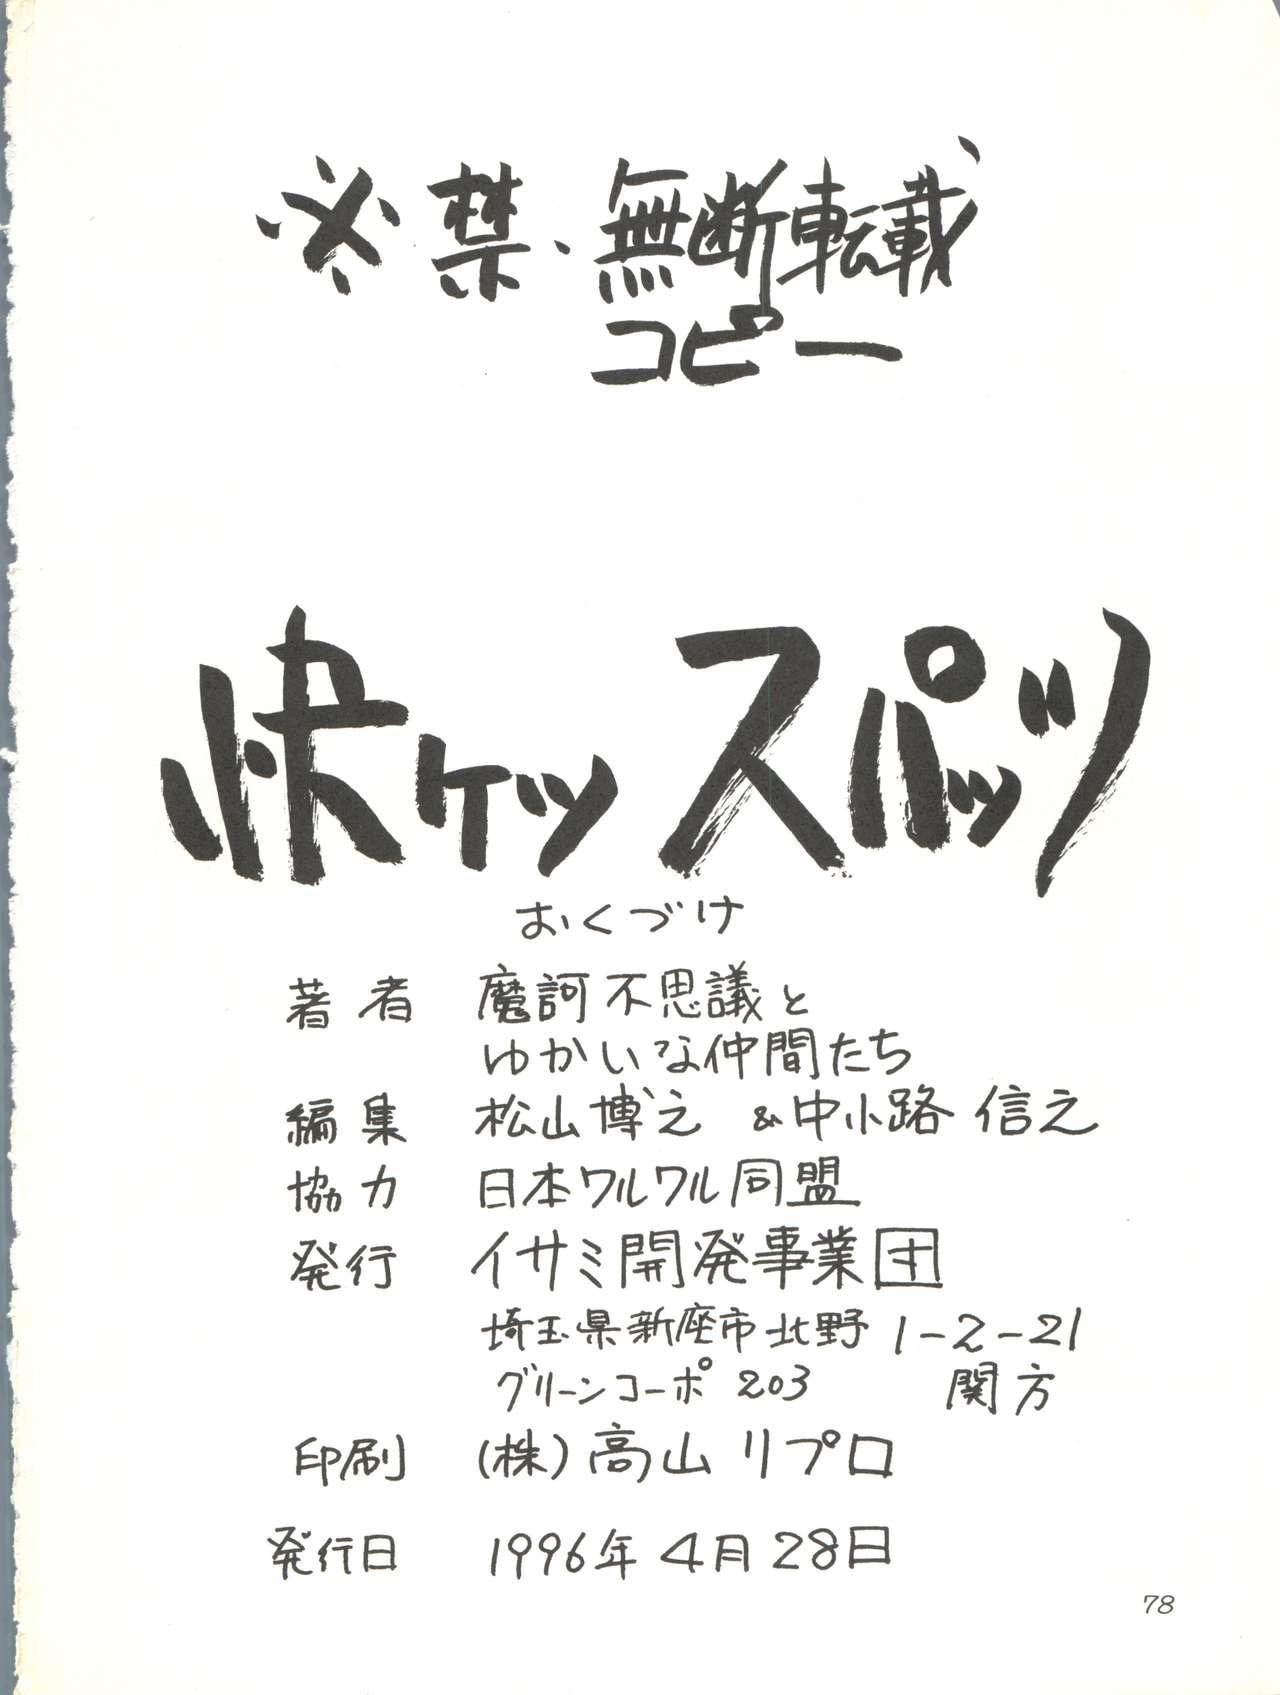 Kaiketsu Spats 77